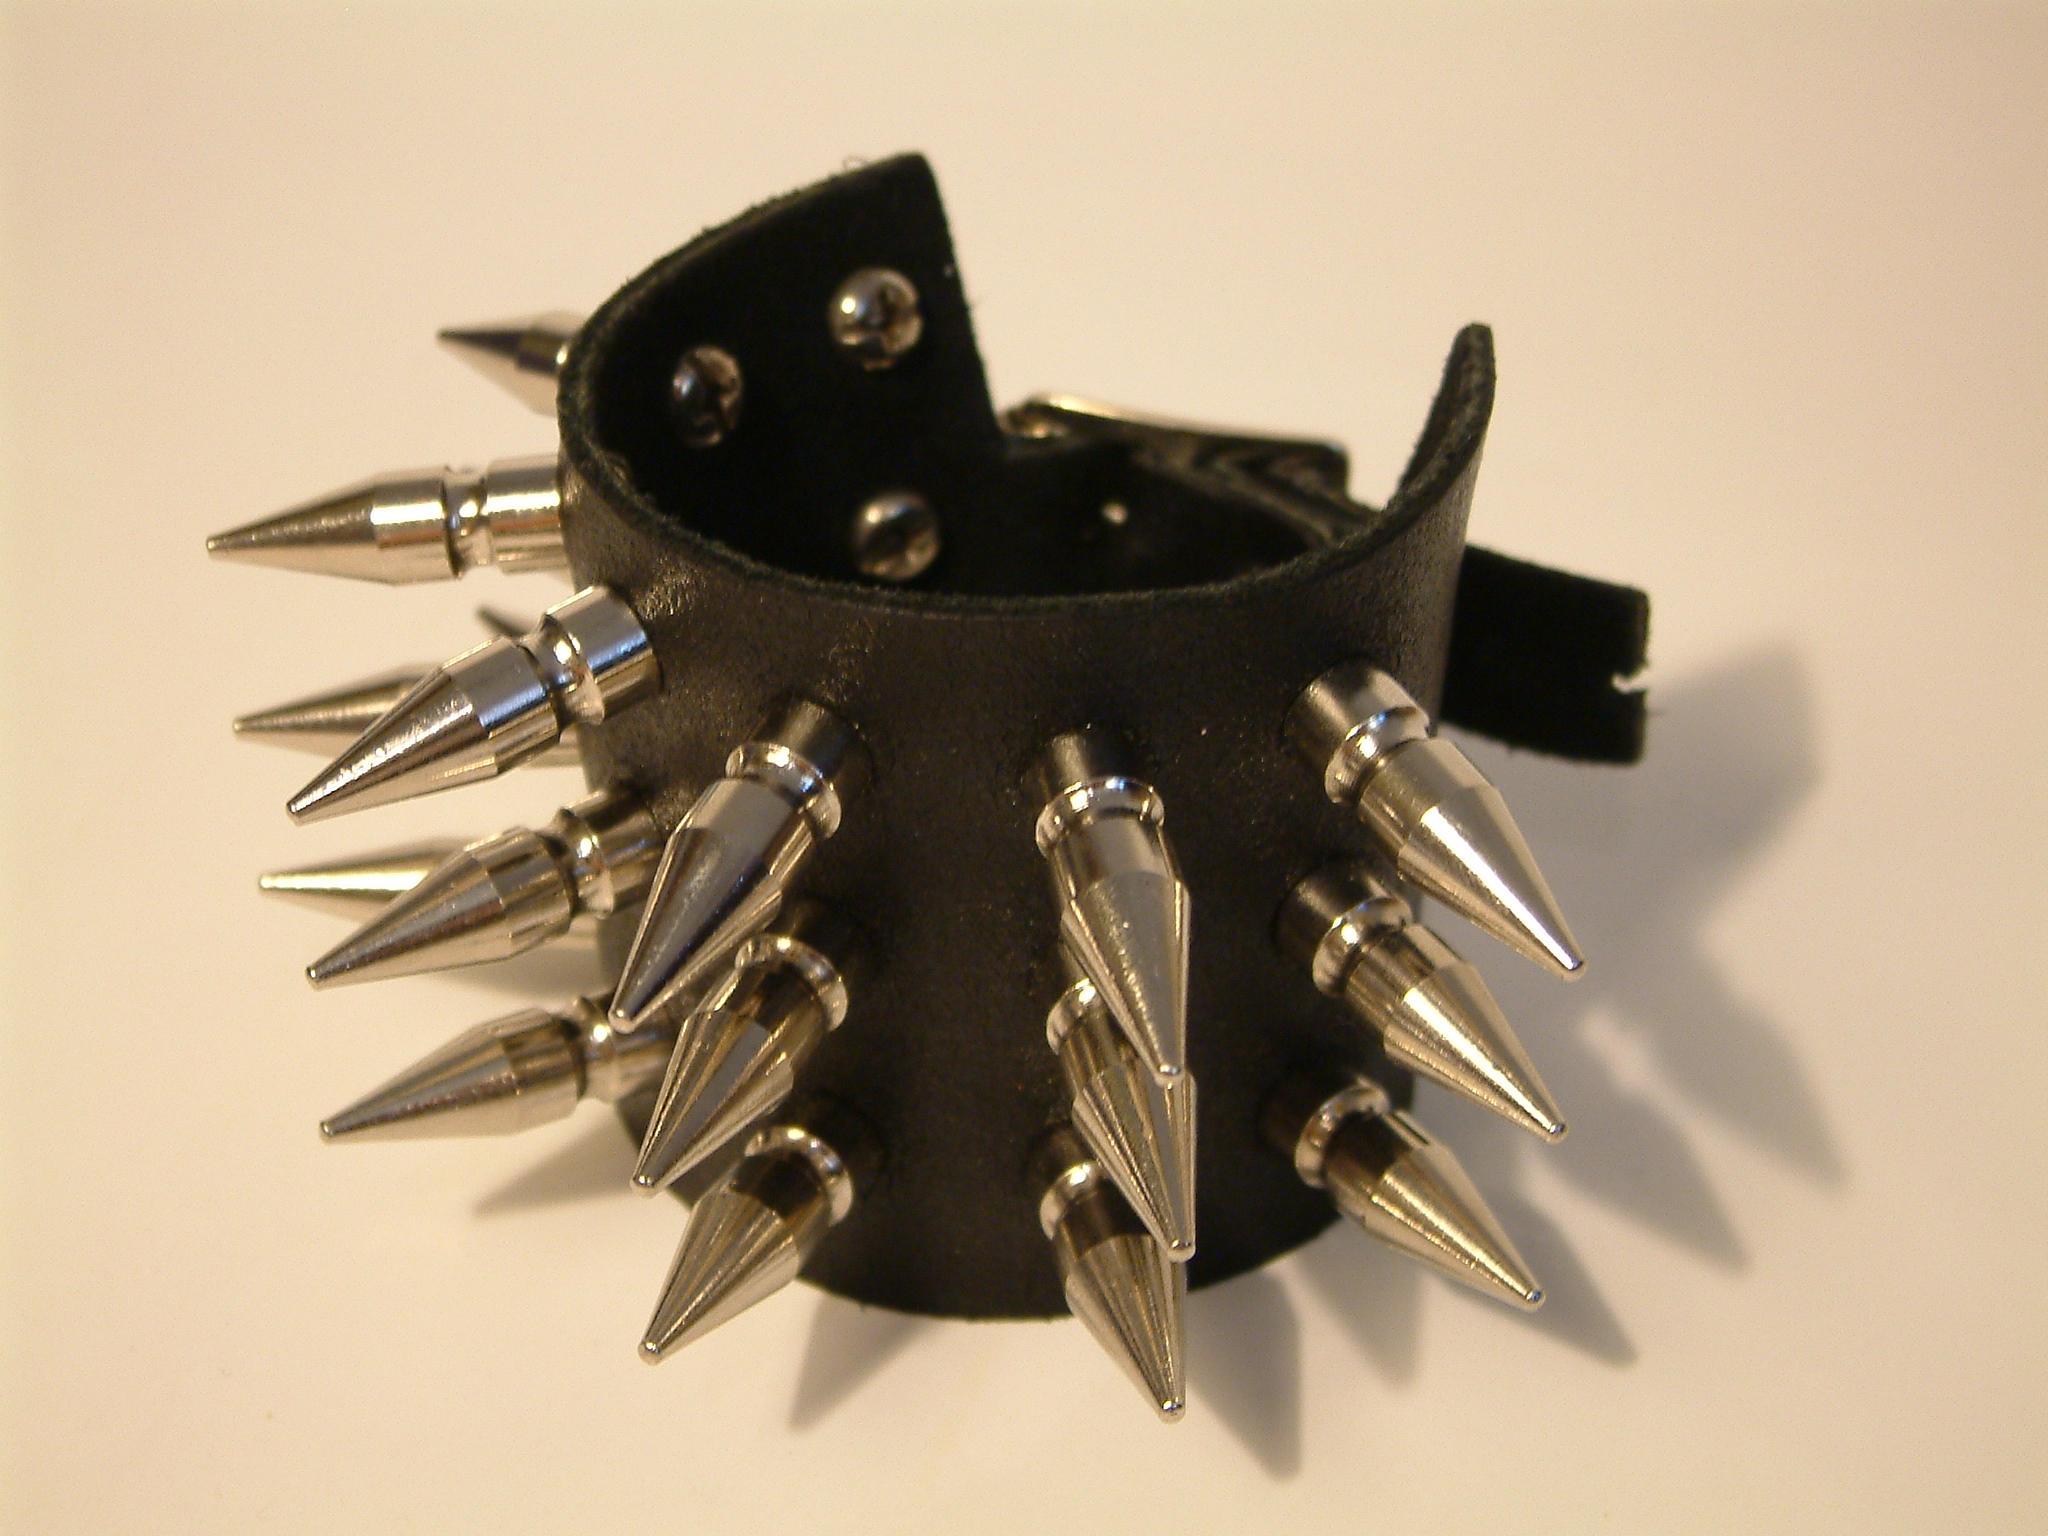 Bracelet stock-photo 2 by damnlife-stock